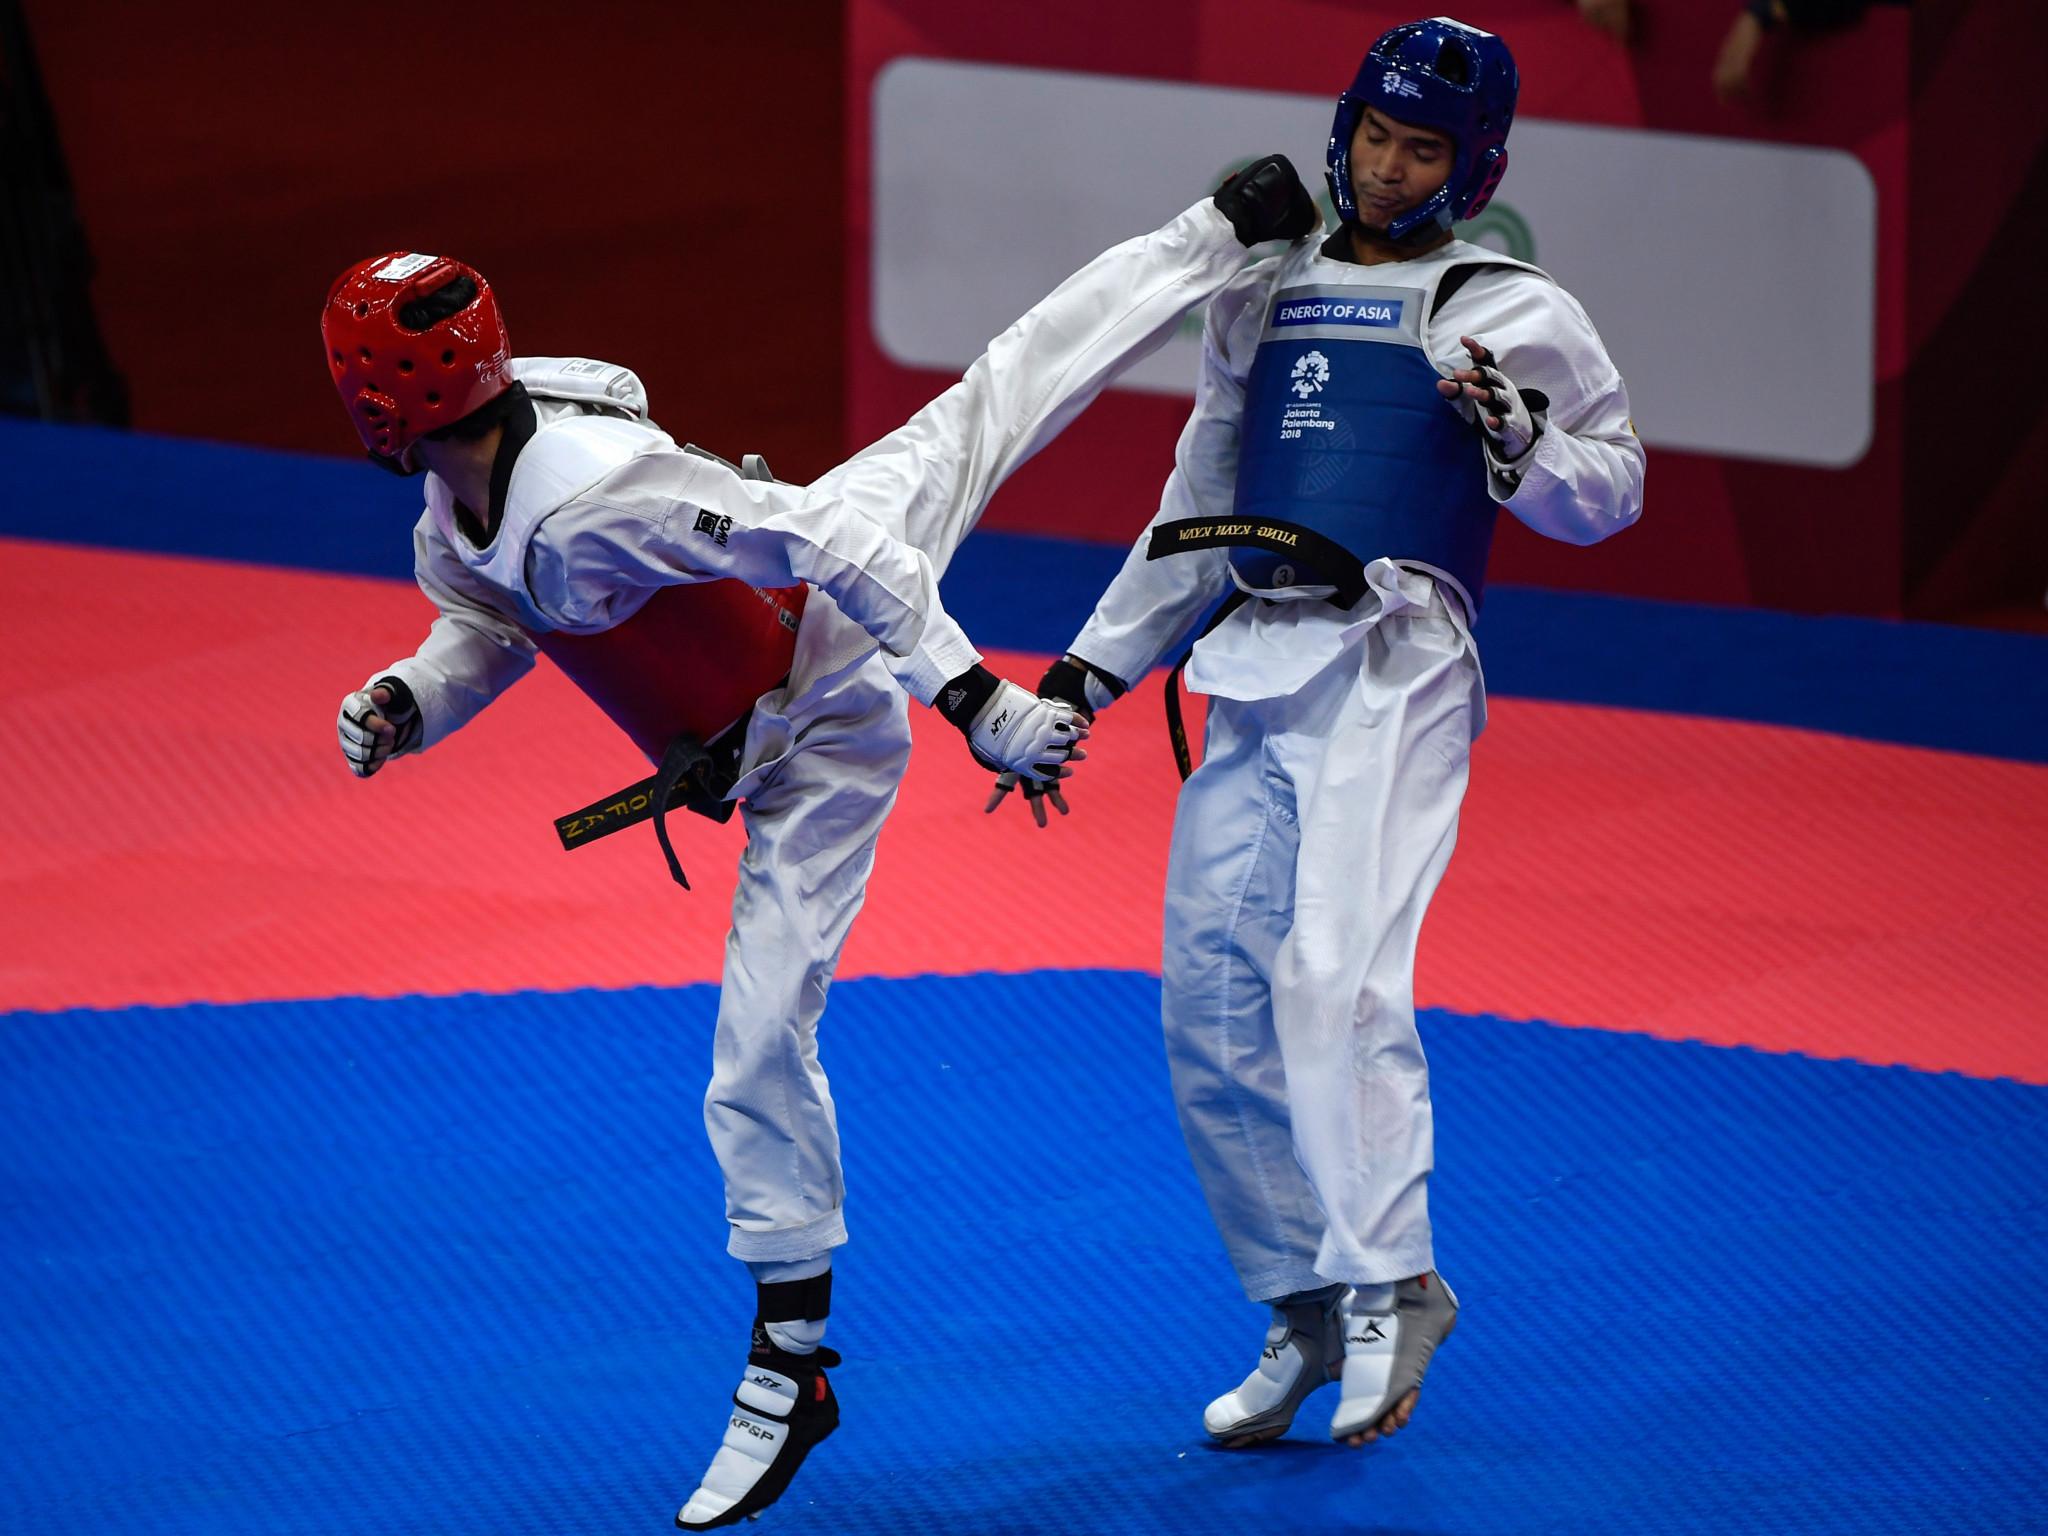 Pakistan's South Asian Games taekwondo medallists rewarded